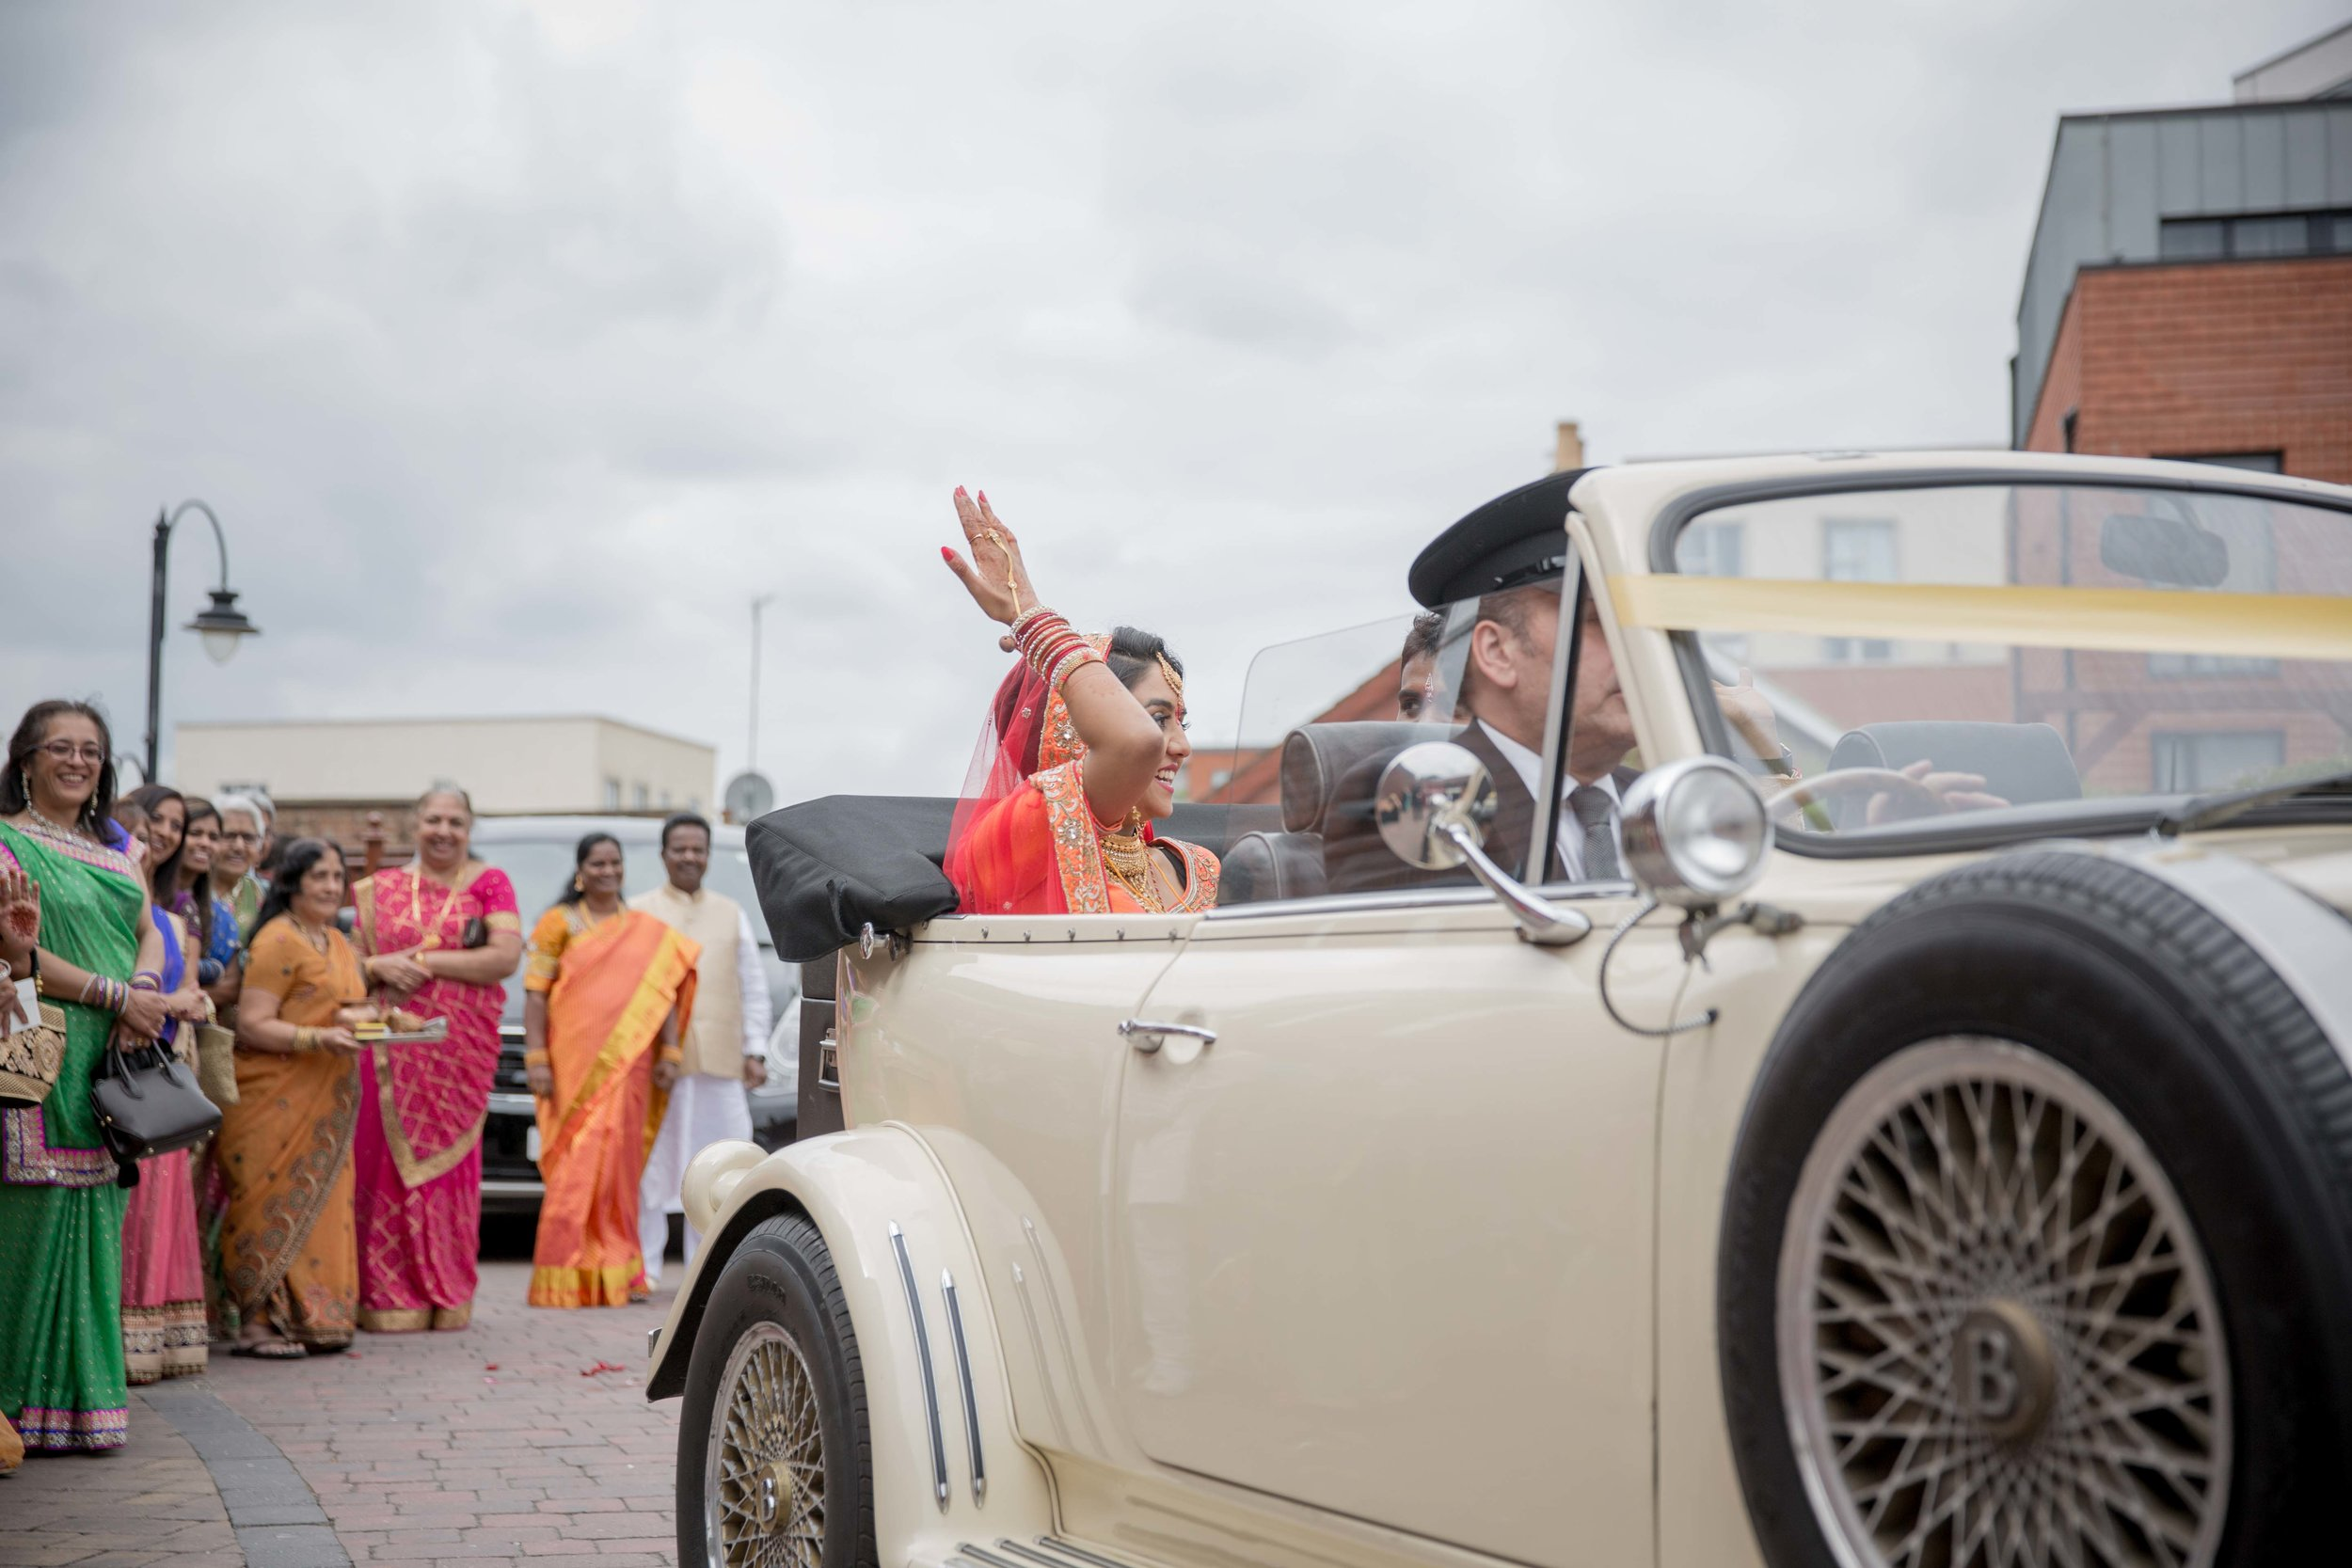 premier-banquetting-london-Hindu-asian-wedding-photographer-natalia-smith-photography-52.jpg